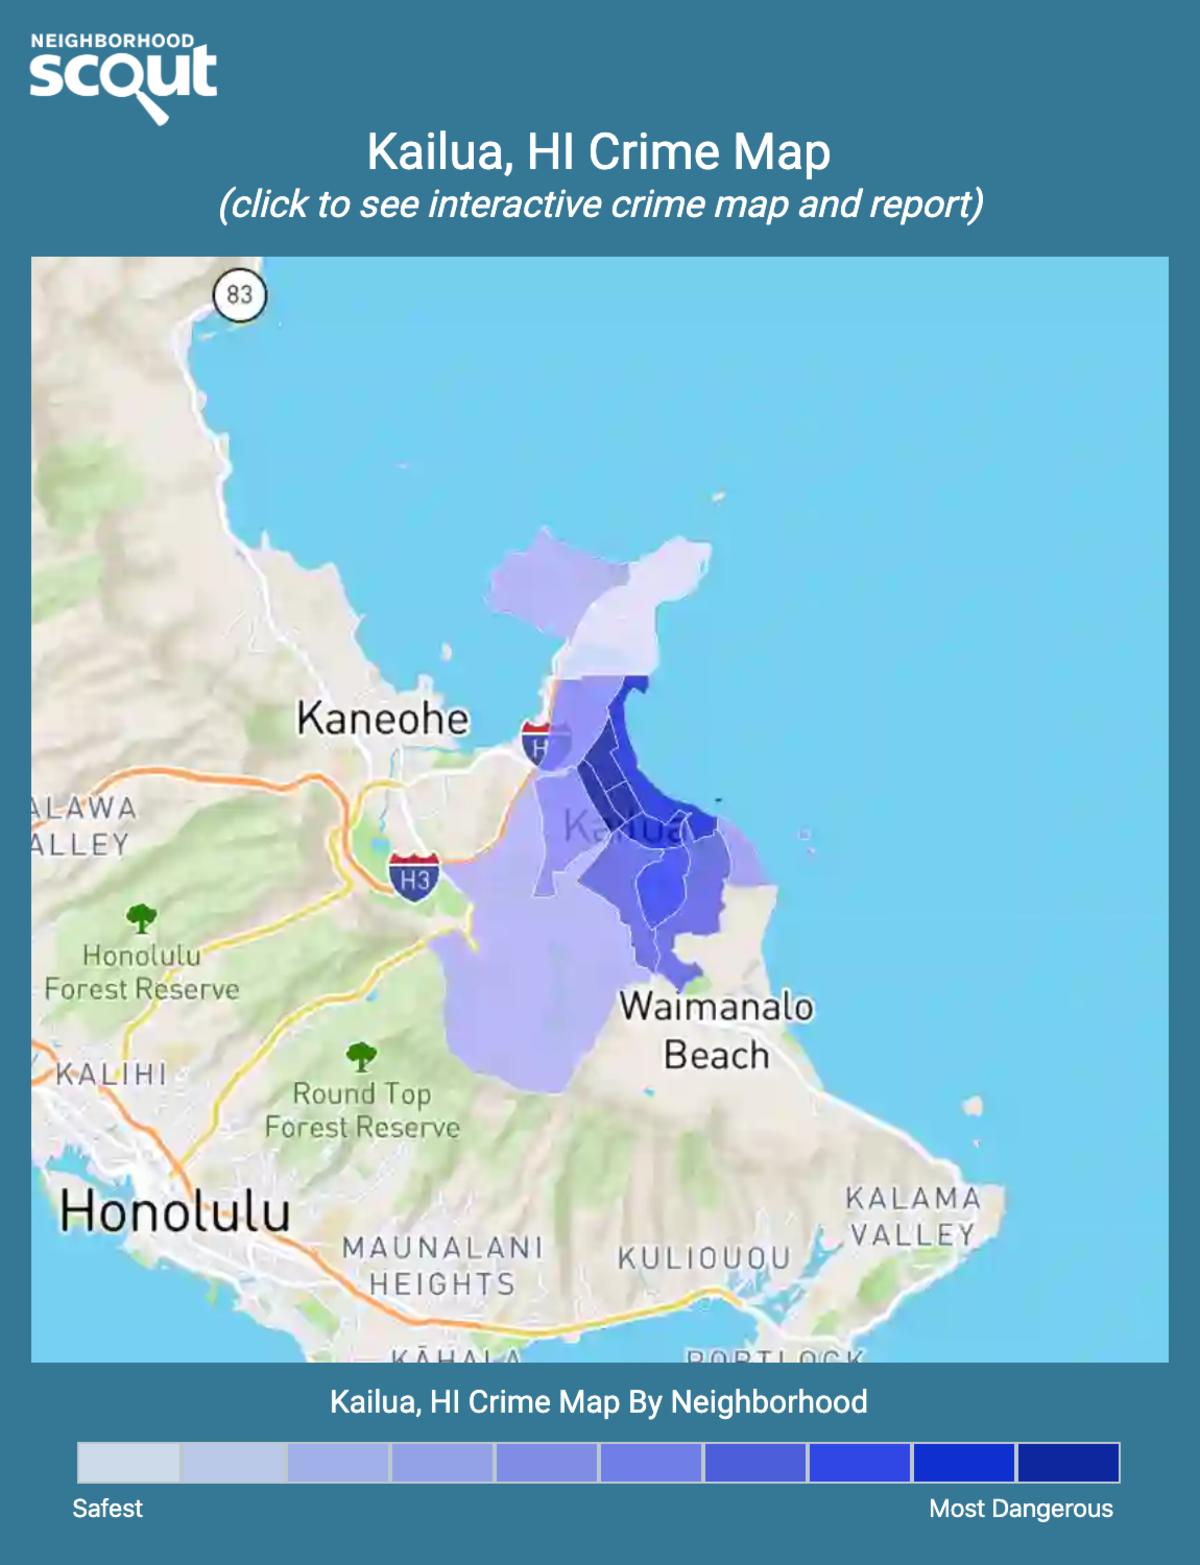 Kailua, Hawaii crime map